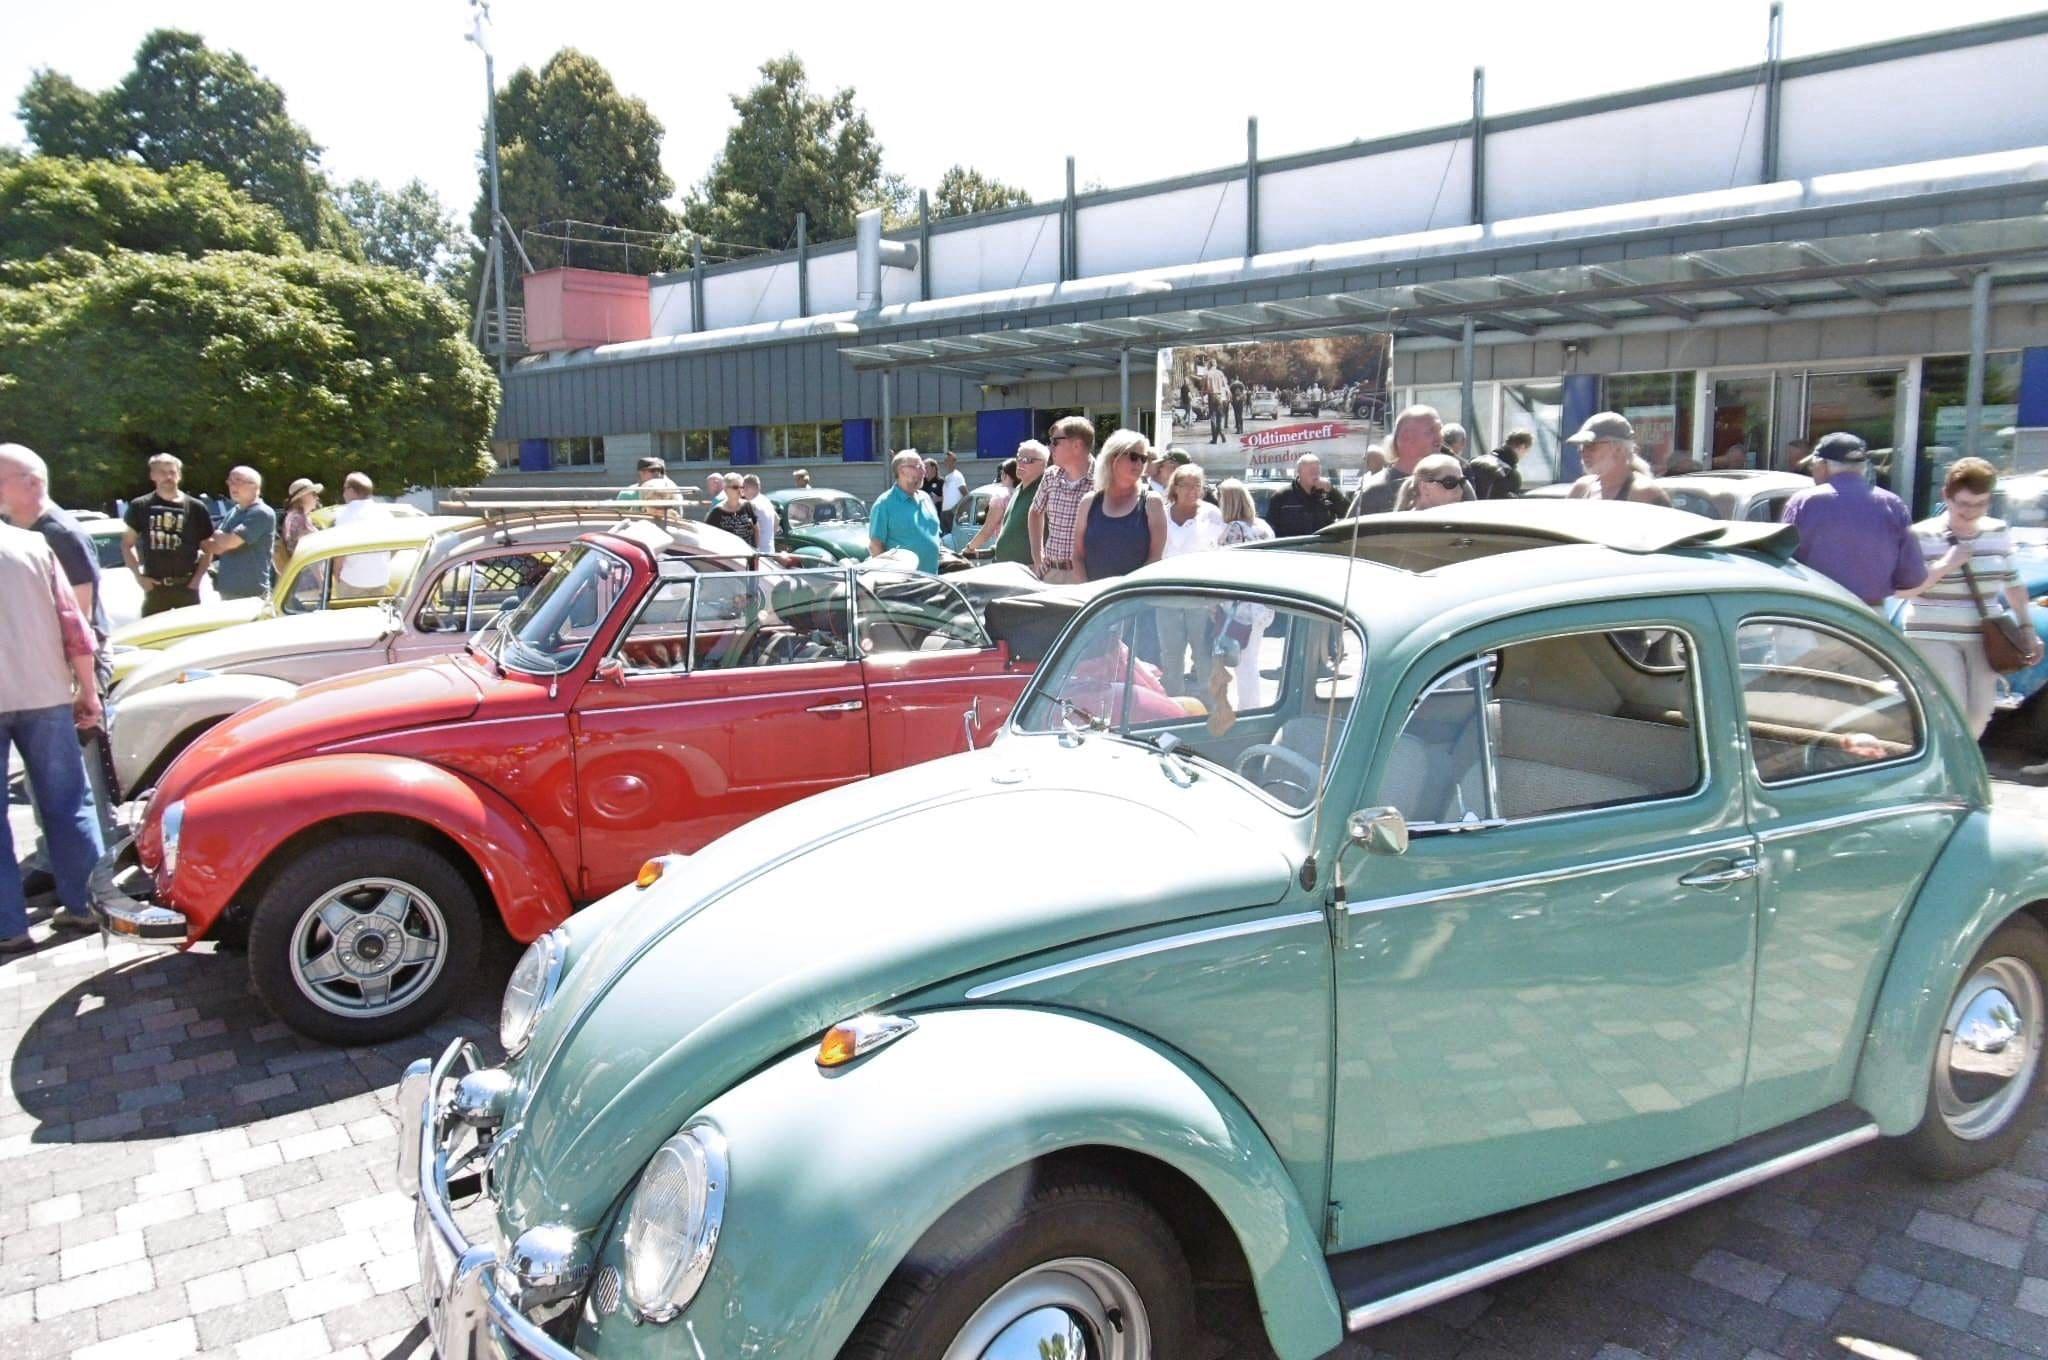 Oldtimertreff Attendorn - Oldtimer - Youngtimer - uto, Bus, LKW, Moped, Motorrad, Trecker oder Sonderfahrzeug